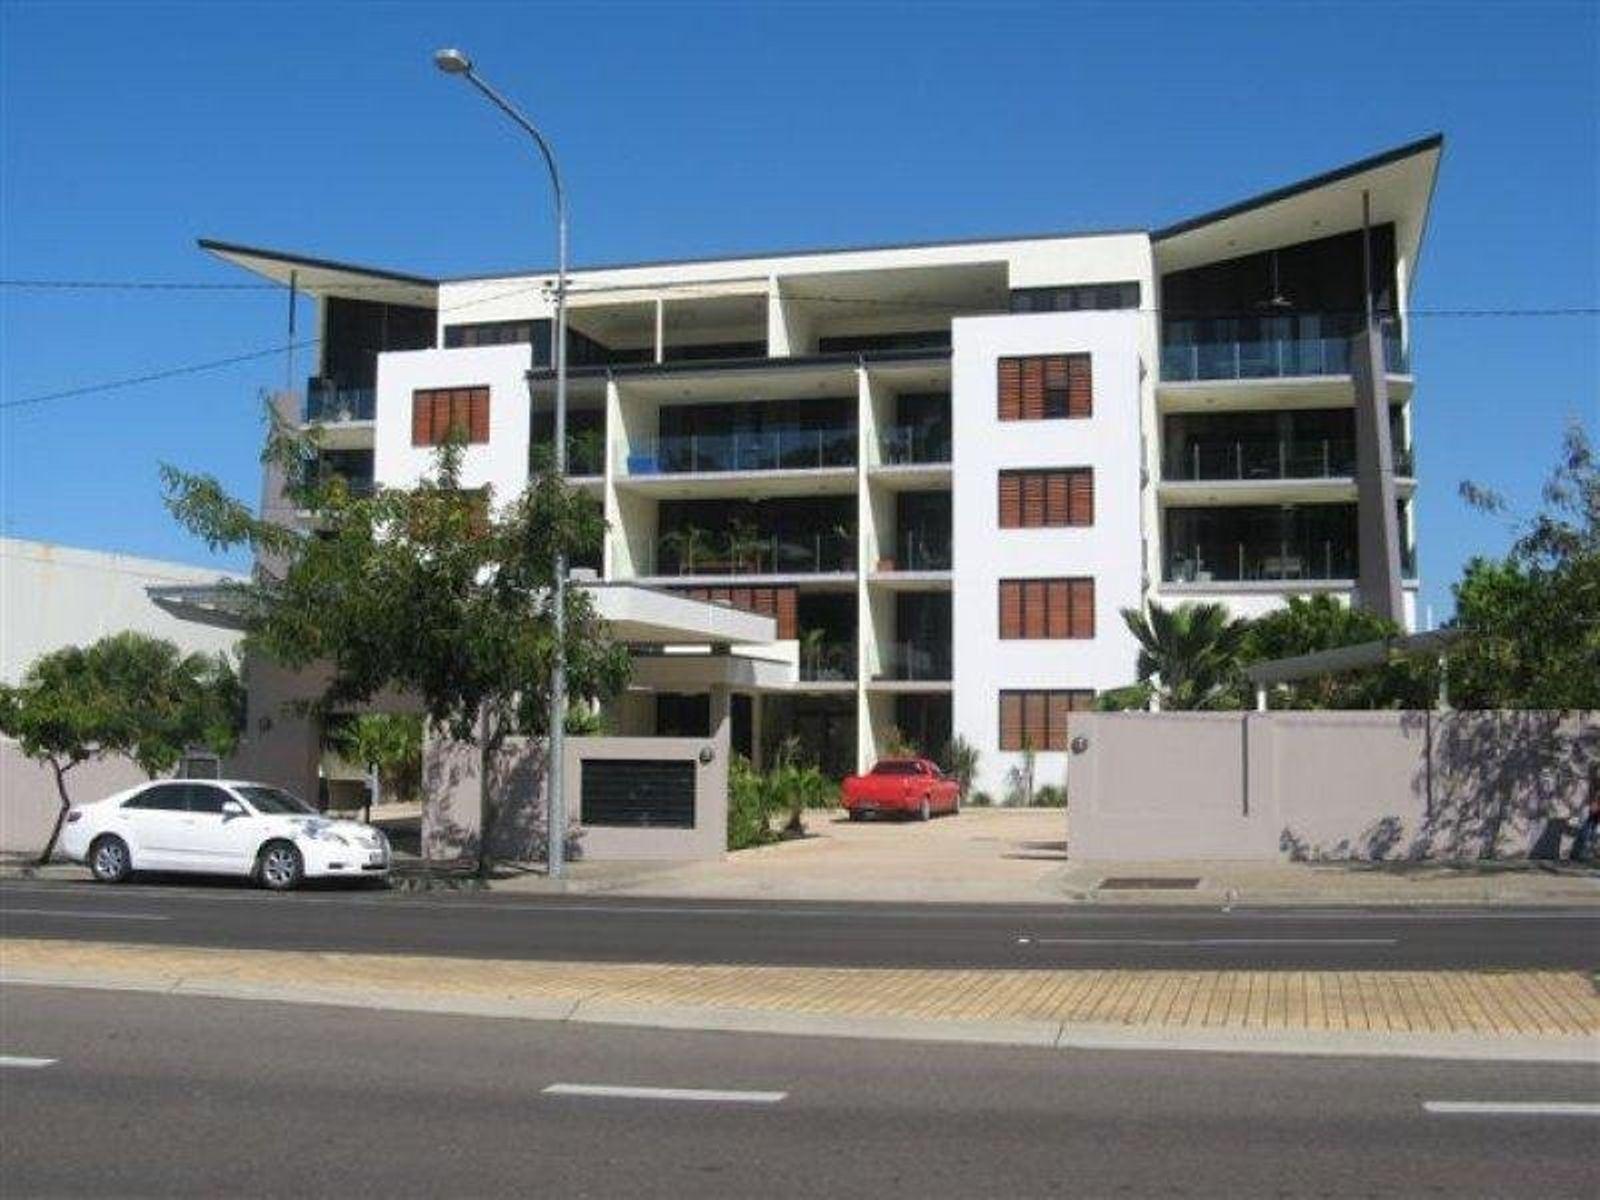 222/330 Sturt Street, Townsville City, QLD 4810